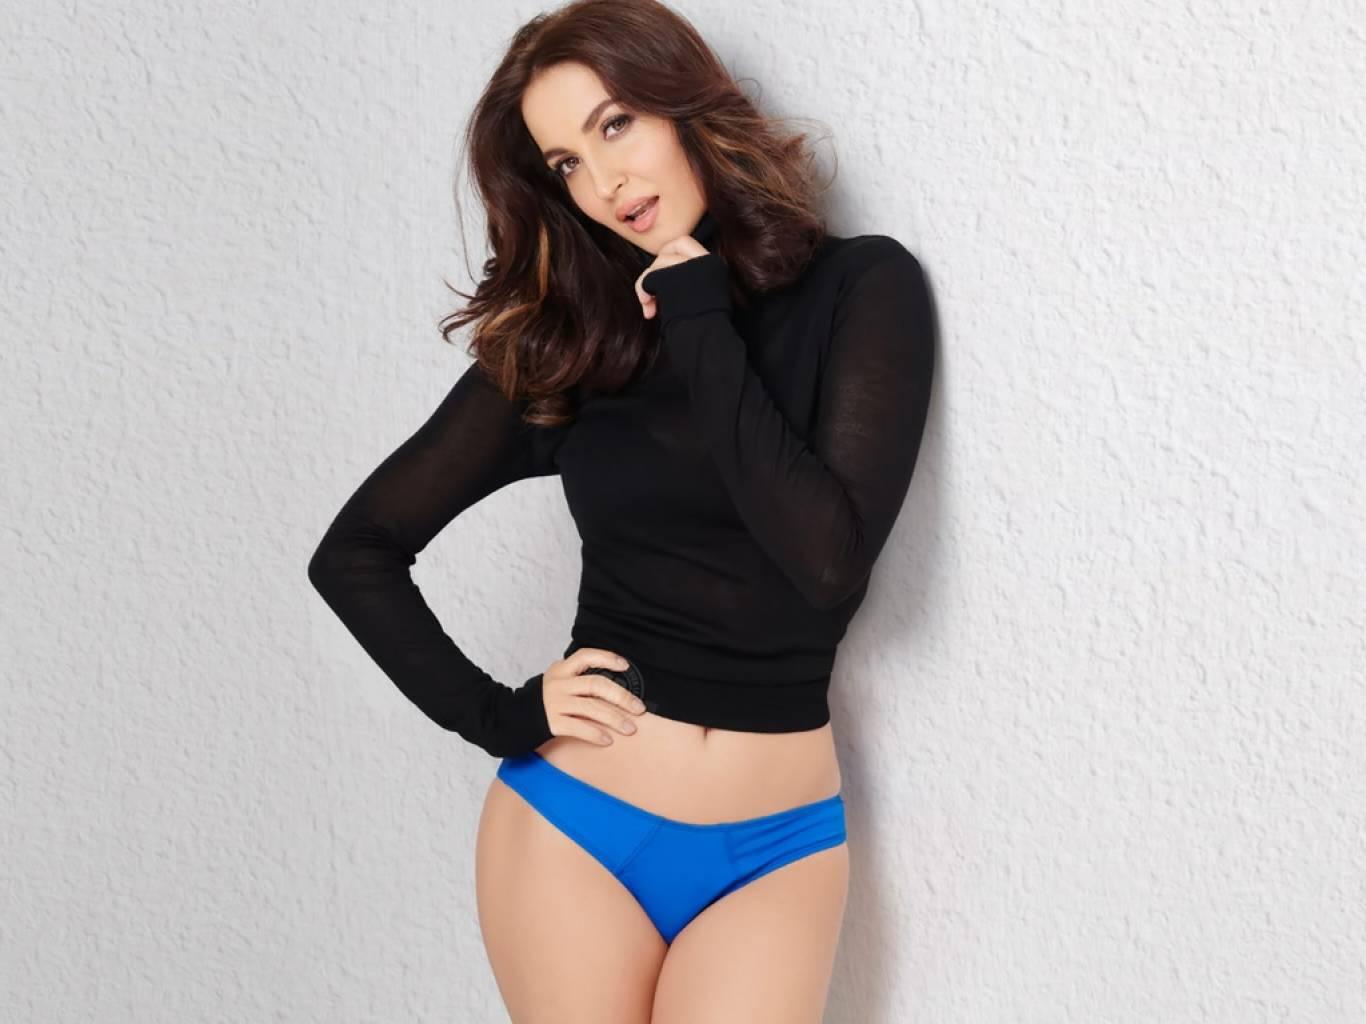 elli-avram-bikini-pics-shows-off-her-curves